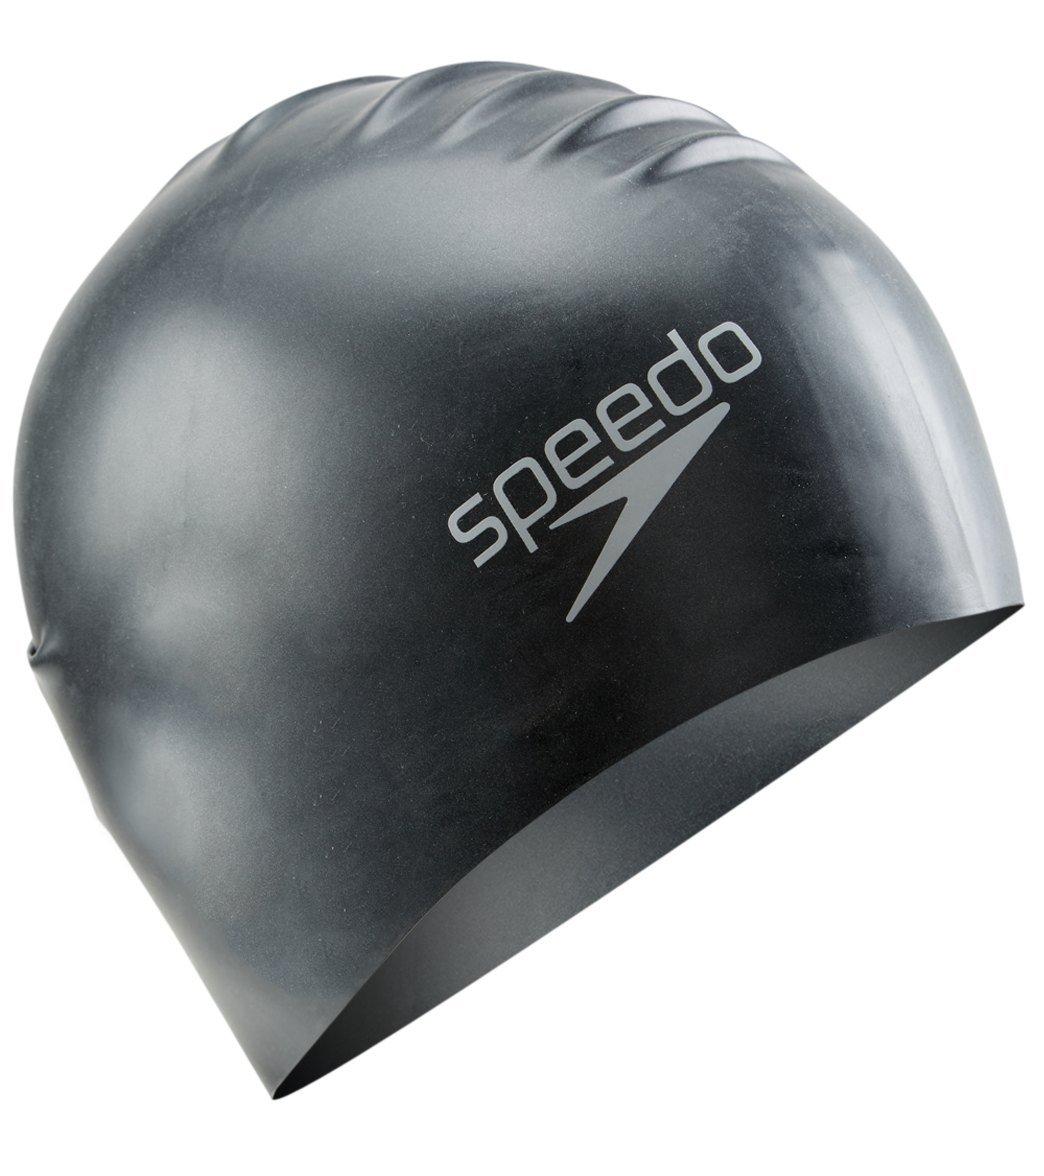 Speedo Silicone Long Hair Cap